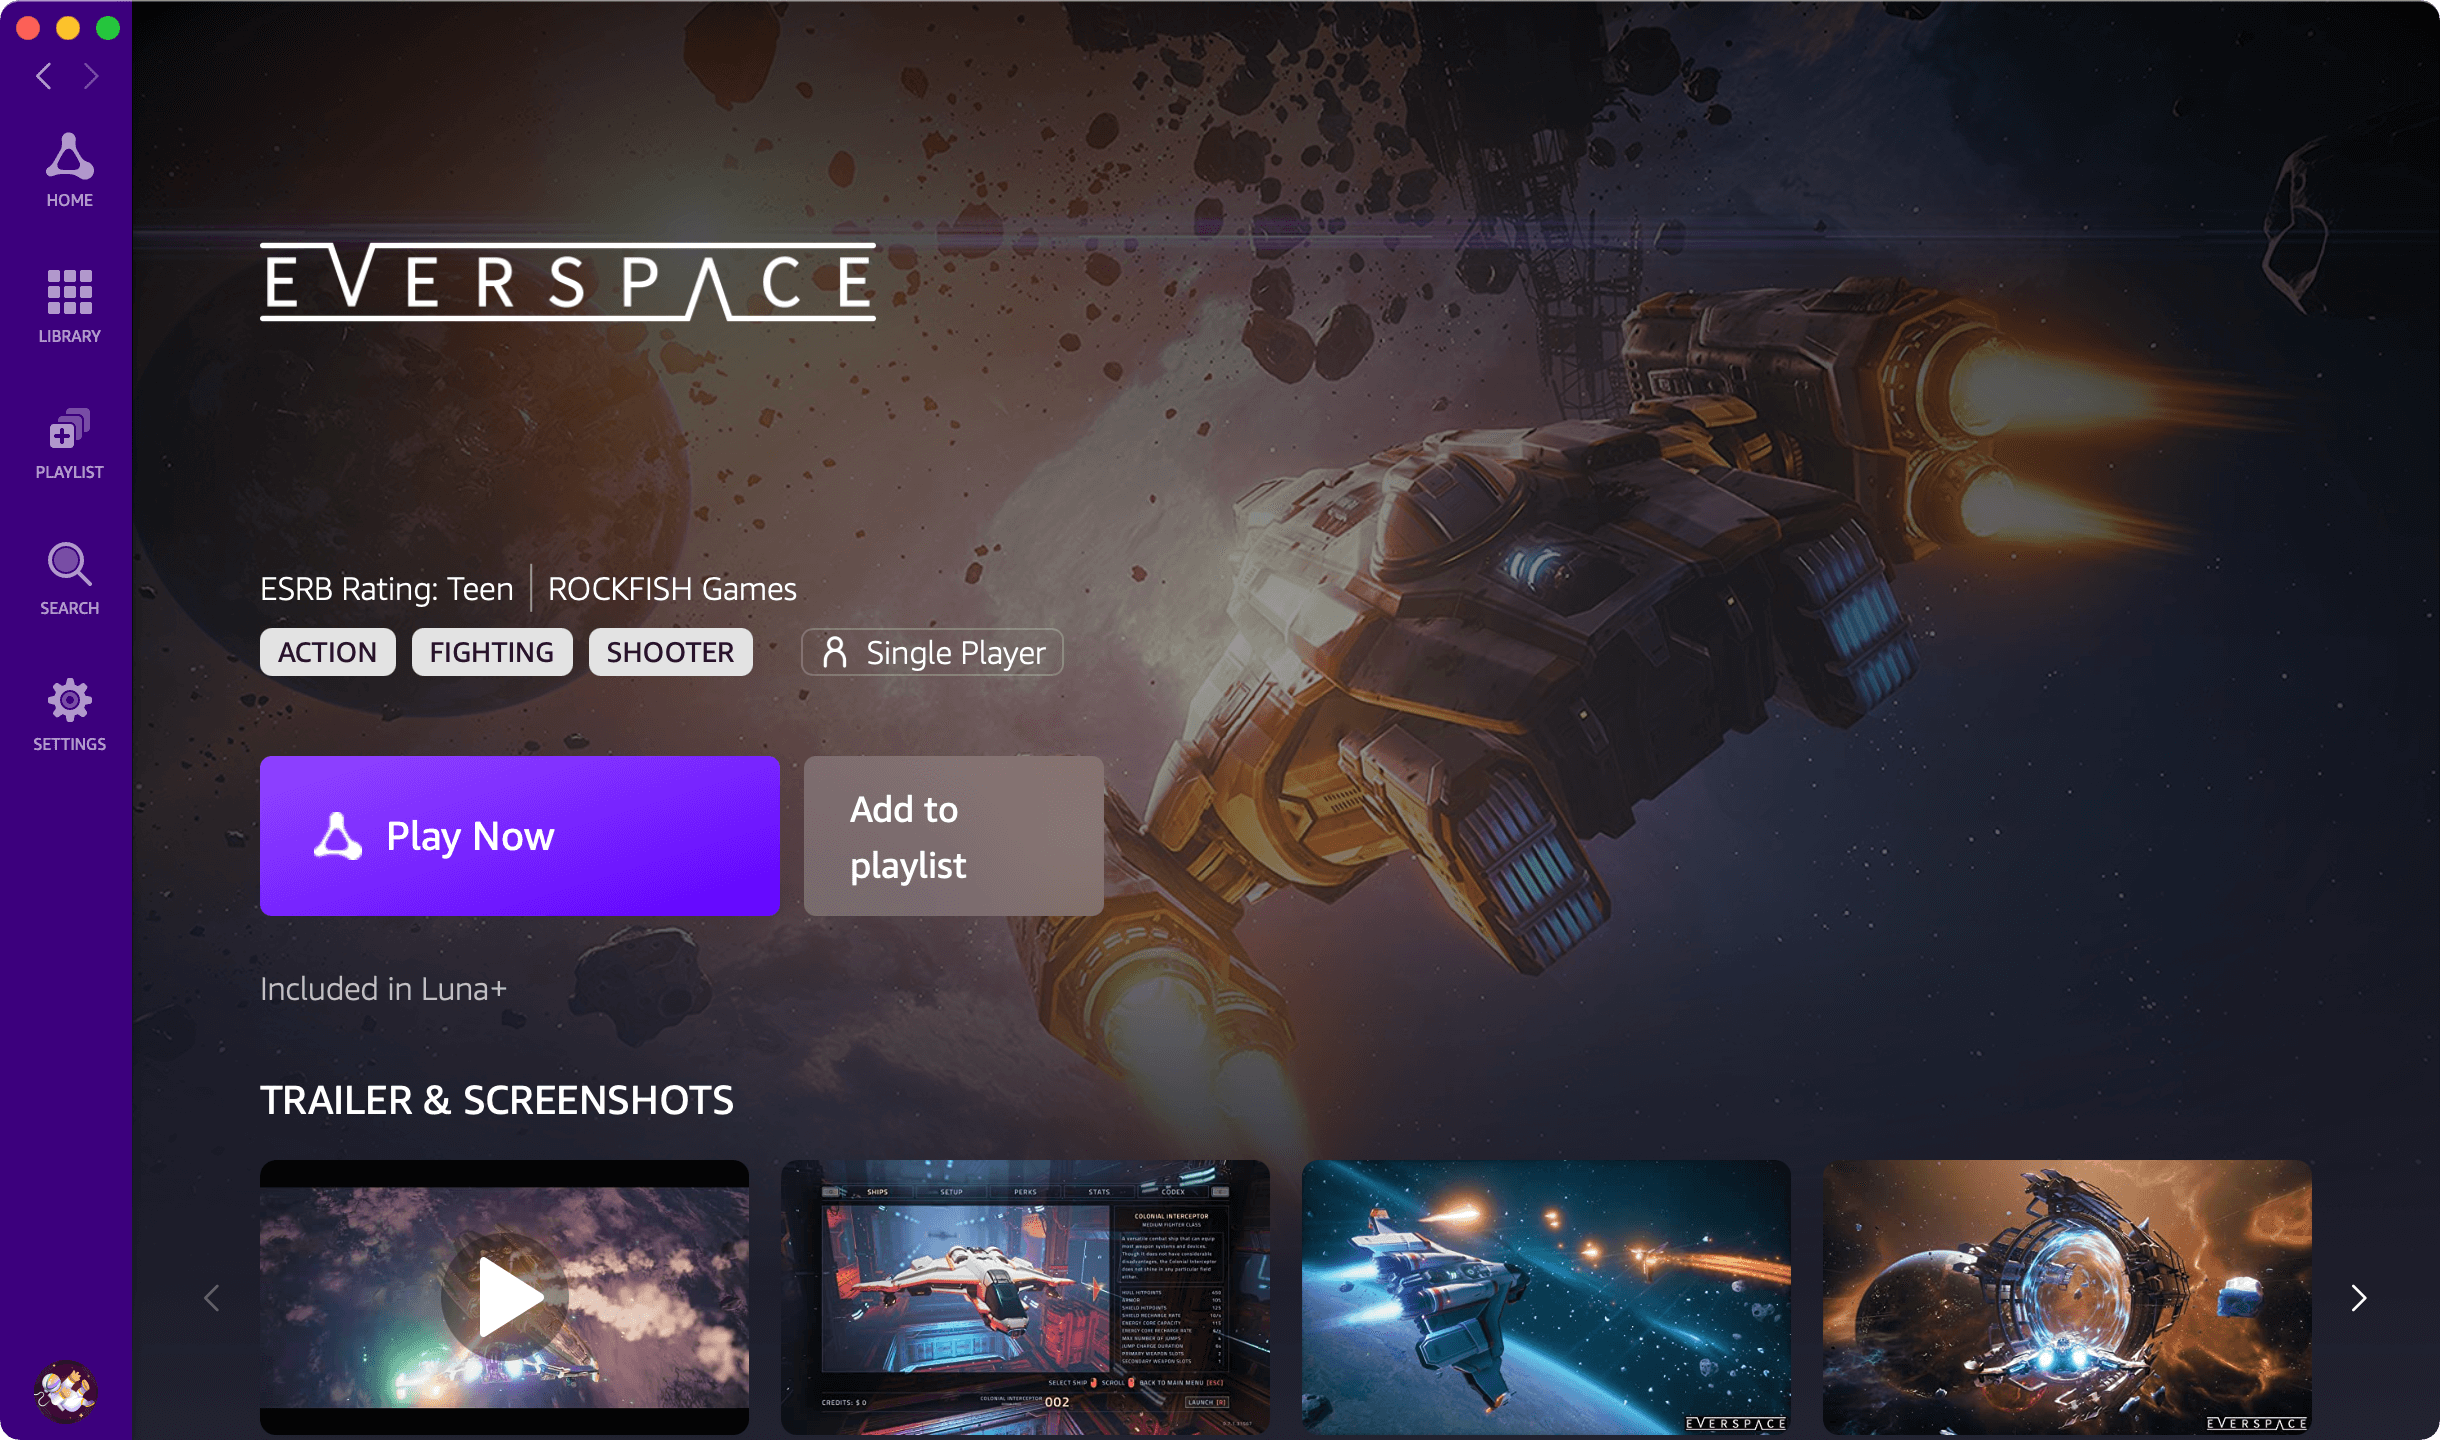 Everspace on Mac